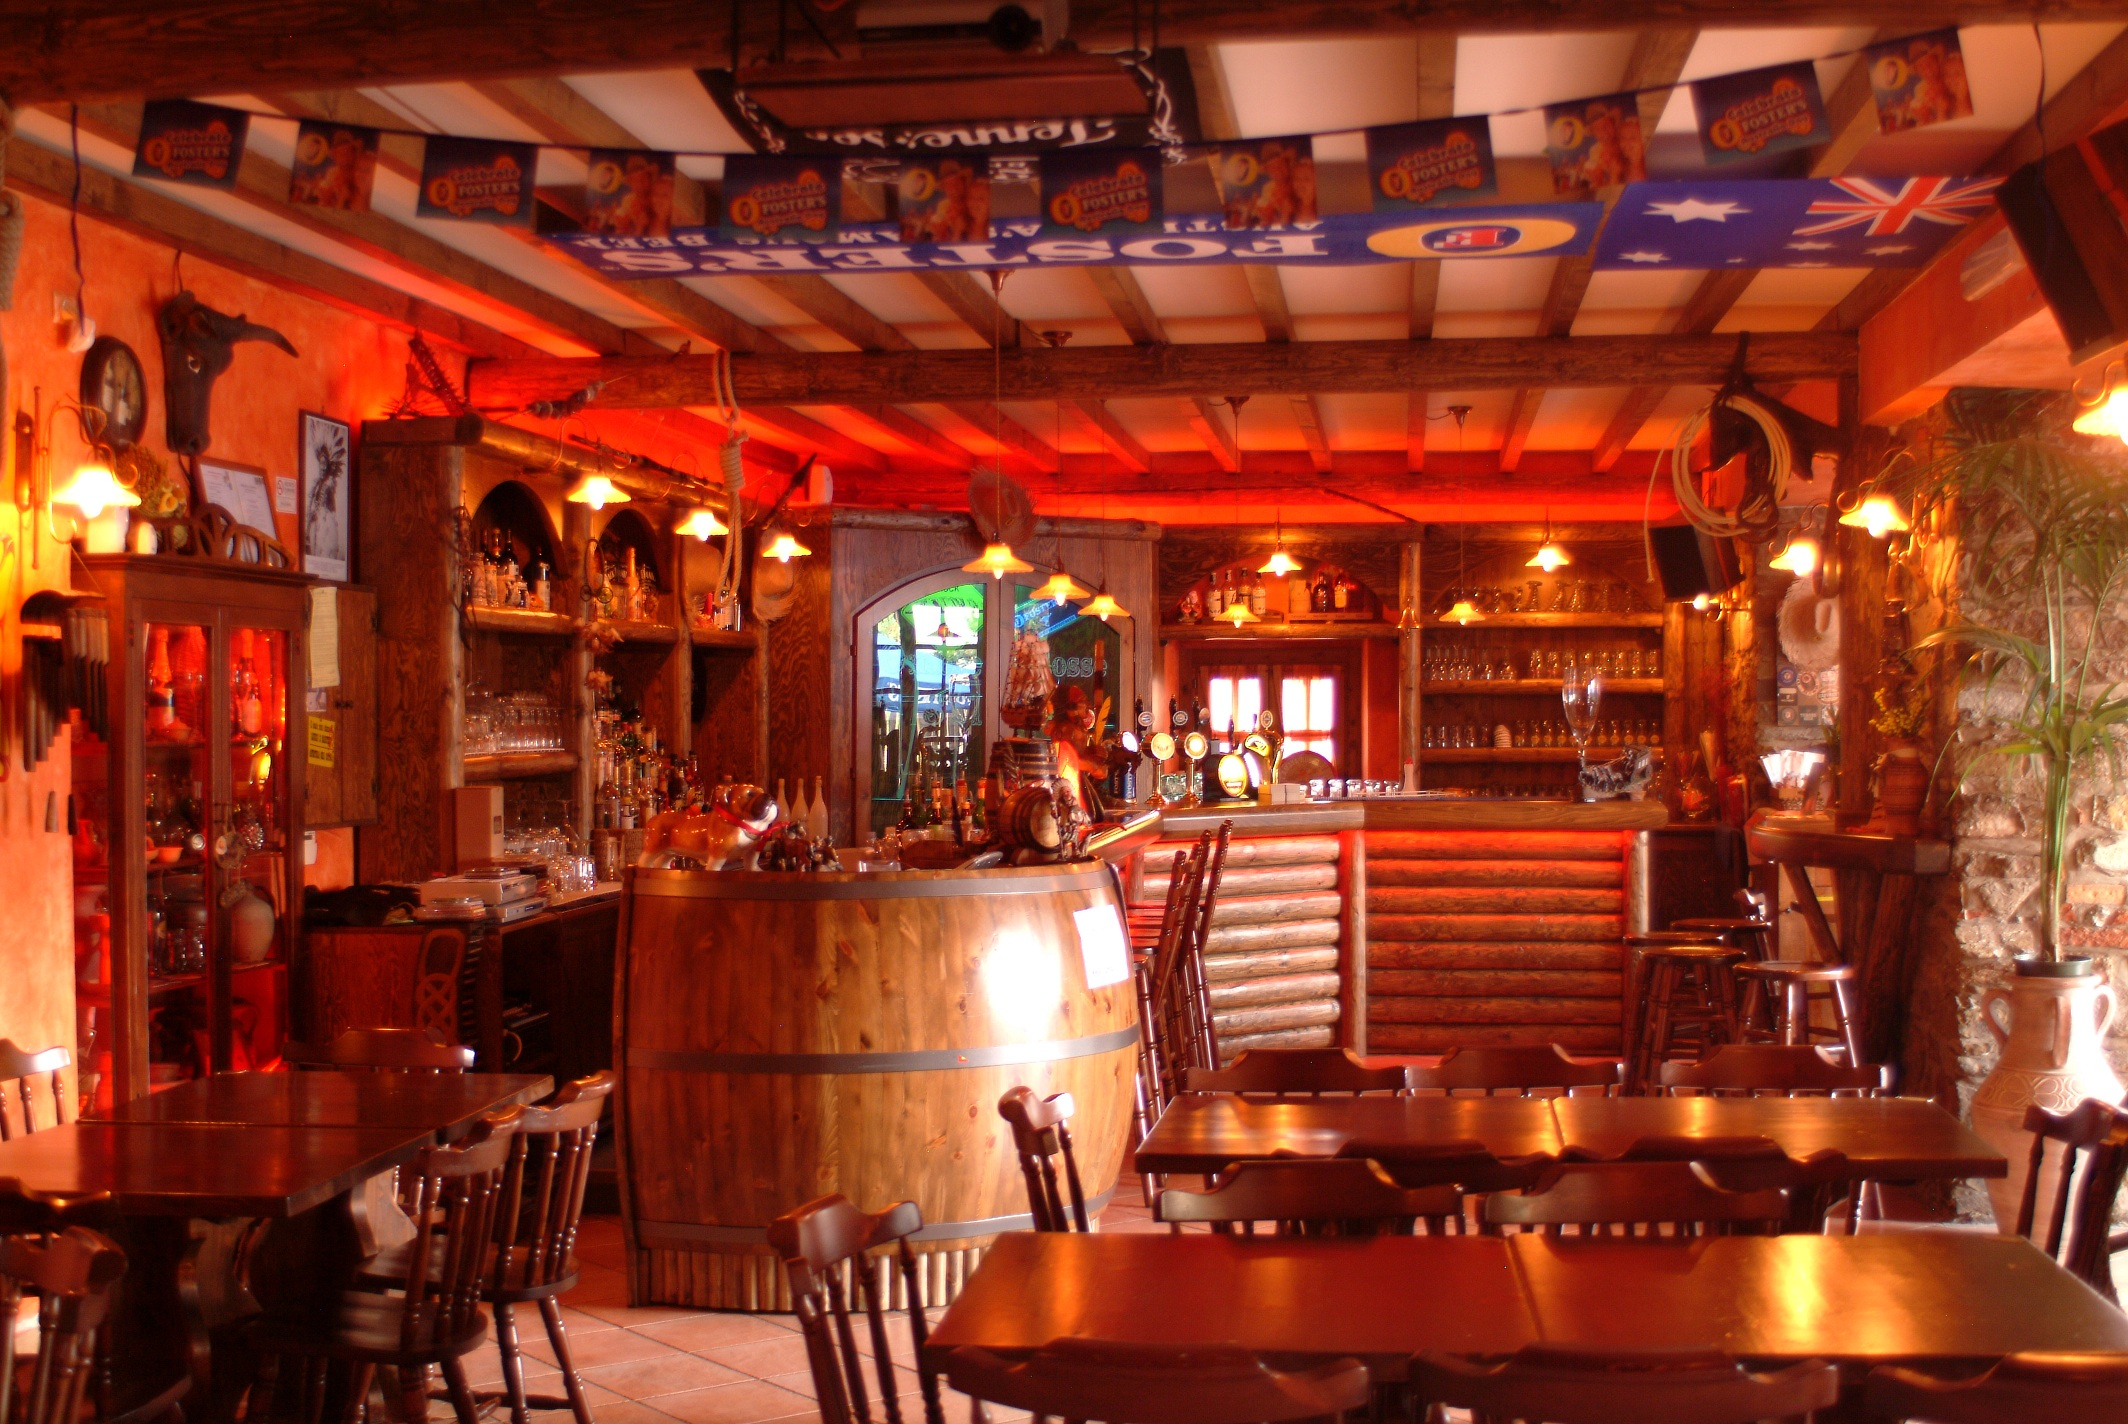 The Saloon  OMBRE ROSSE SALOON WESTERN PUB AGROPOLISA